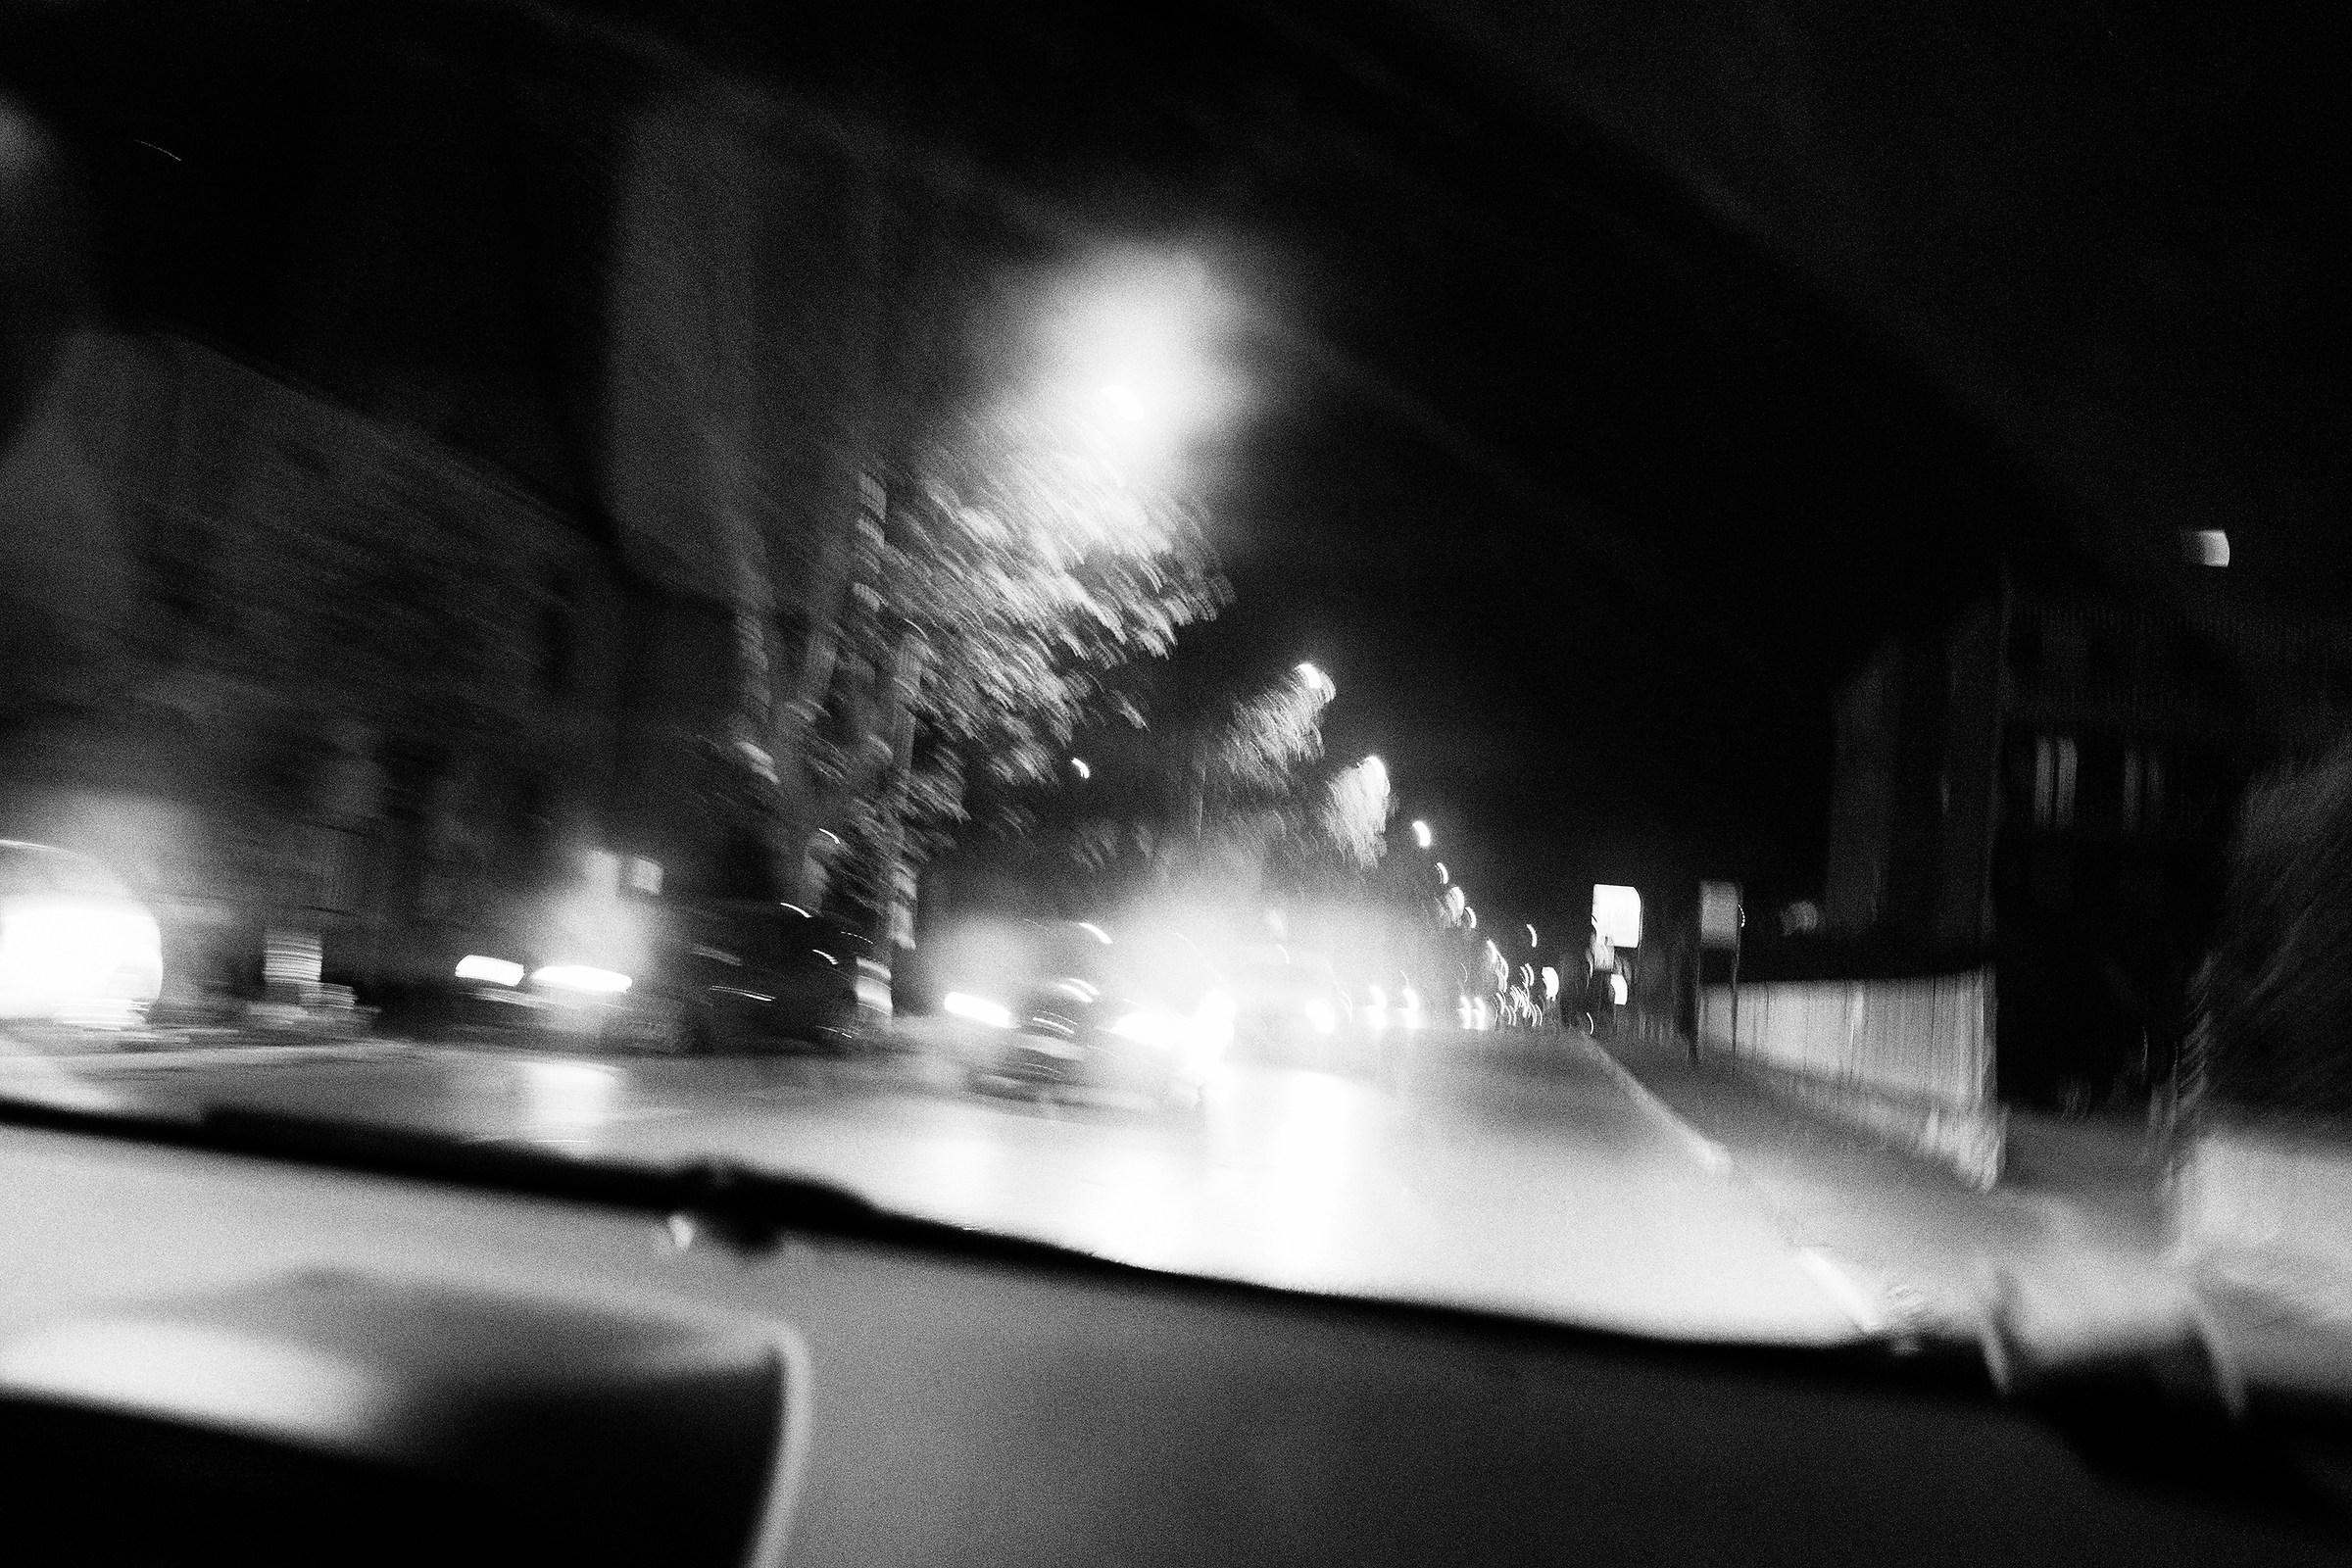 The descent into the underworld: accompany me home...